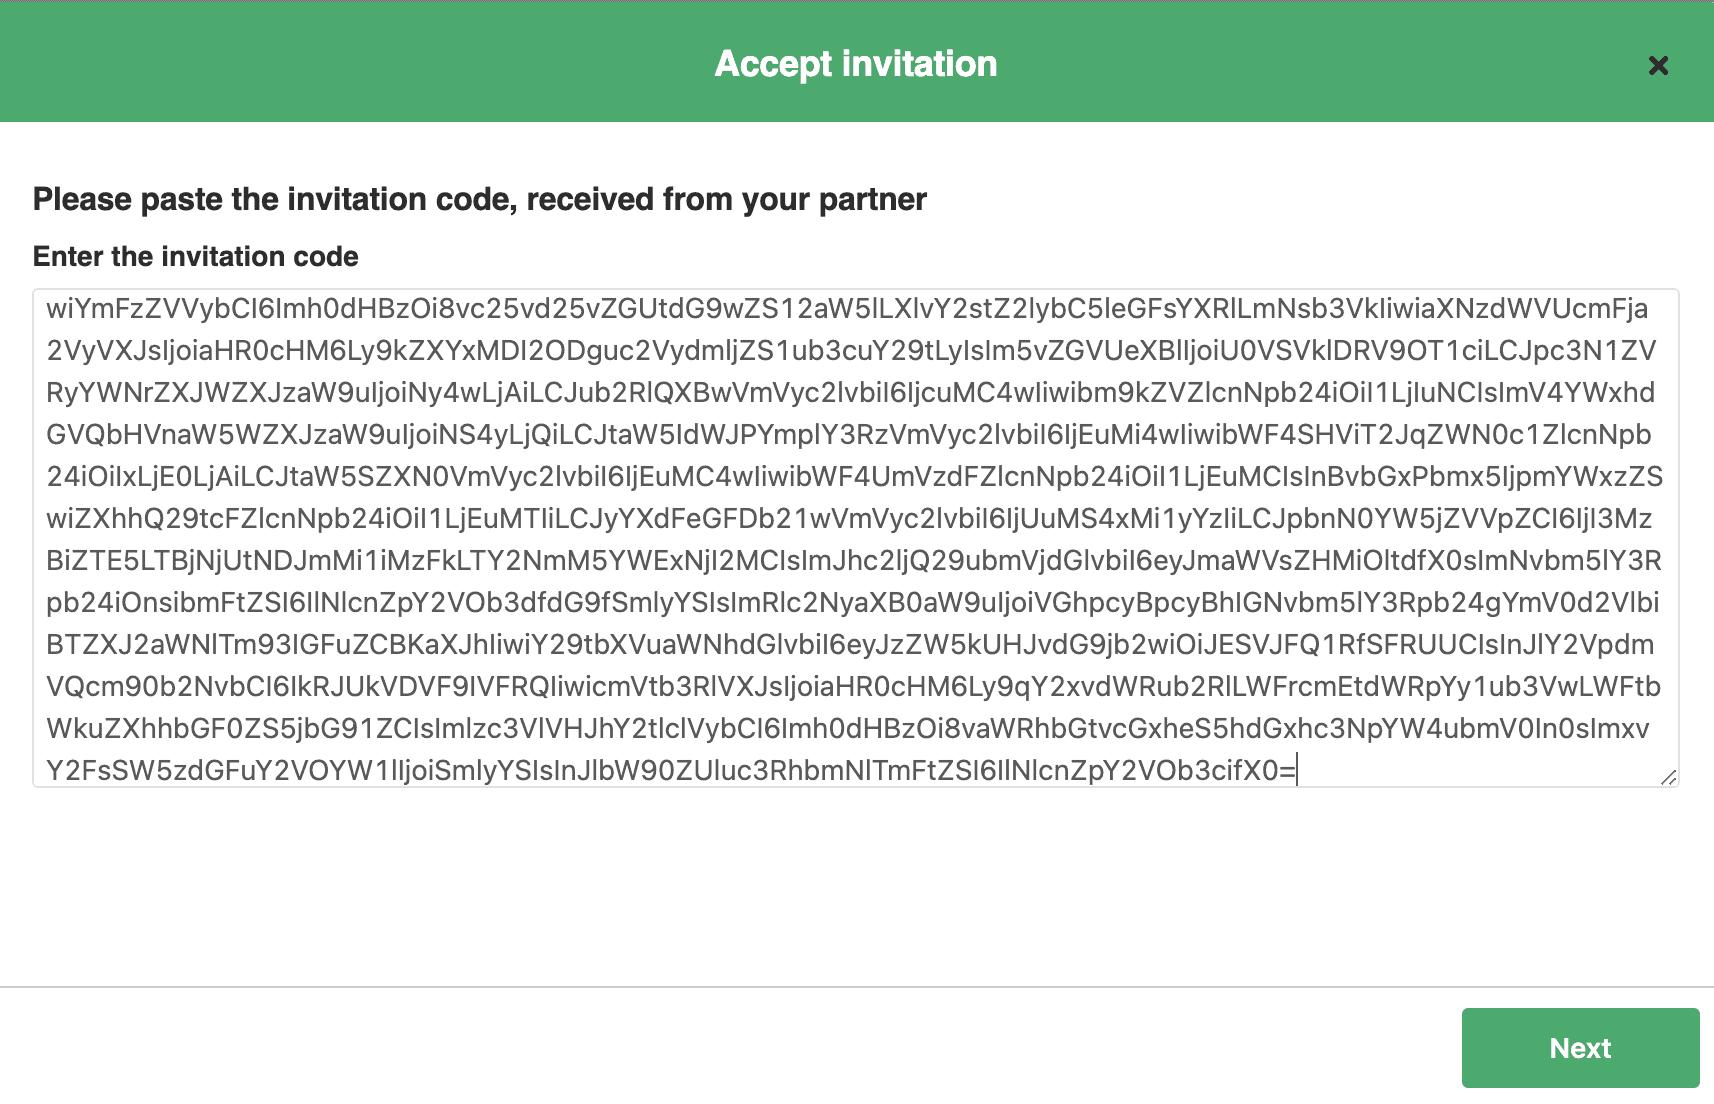 Accept Integration invitation